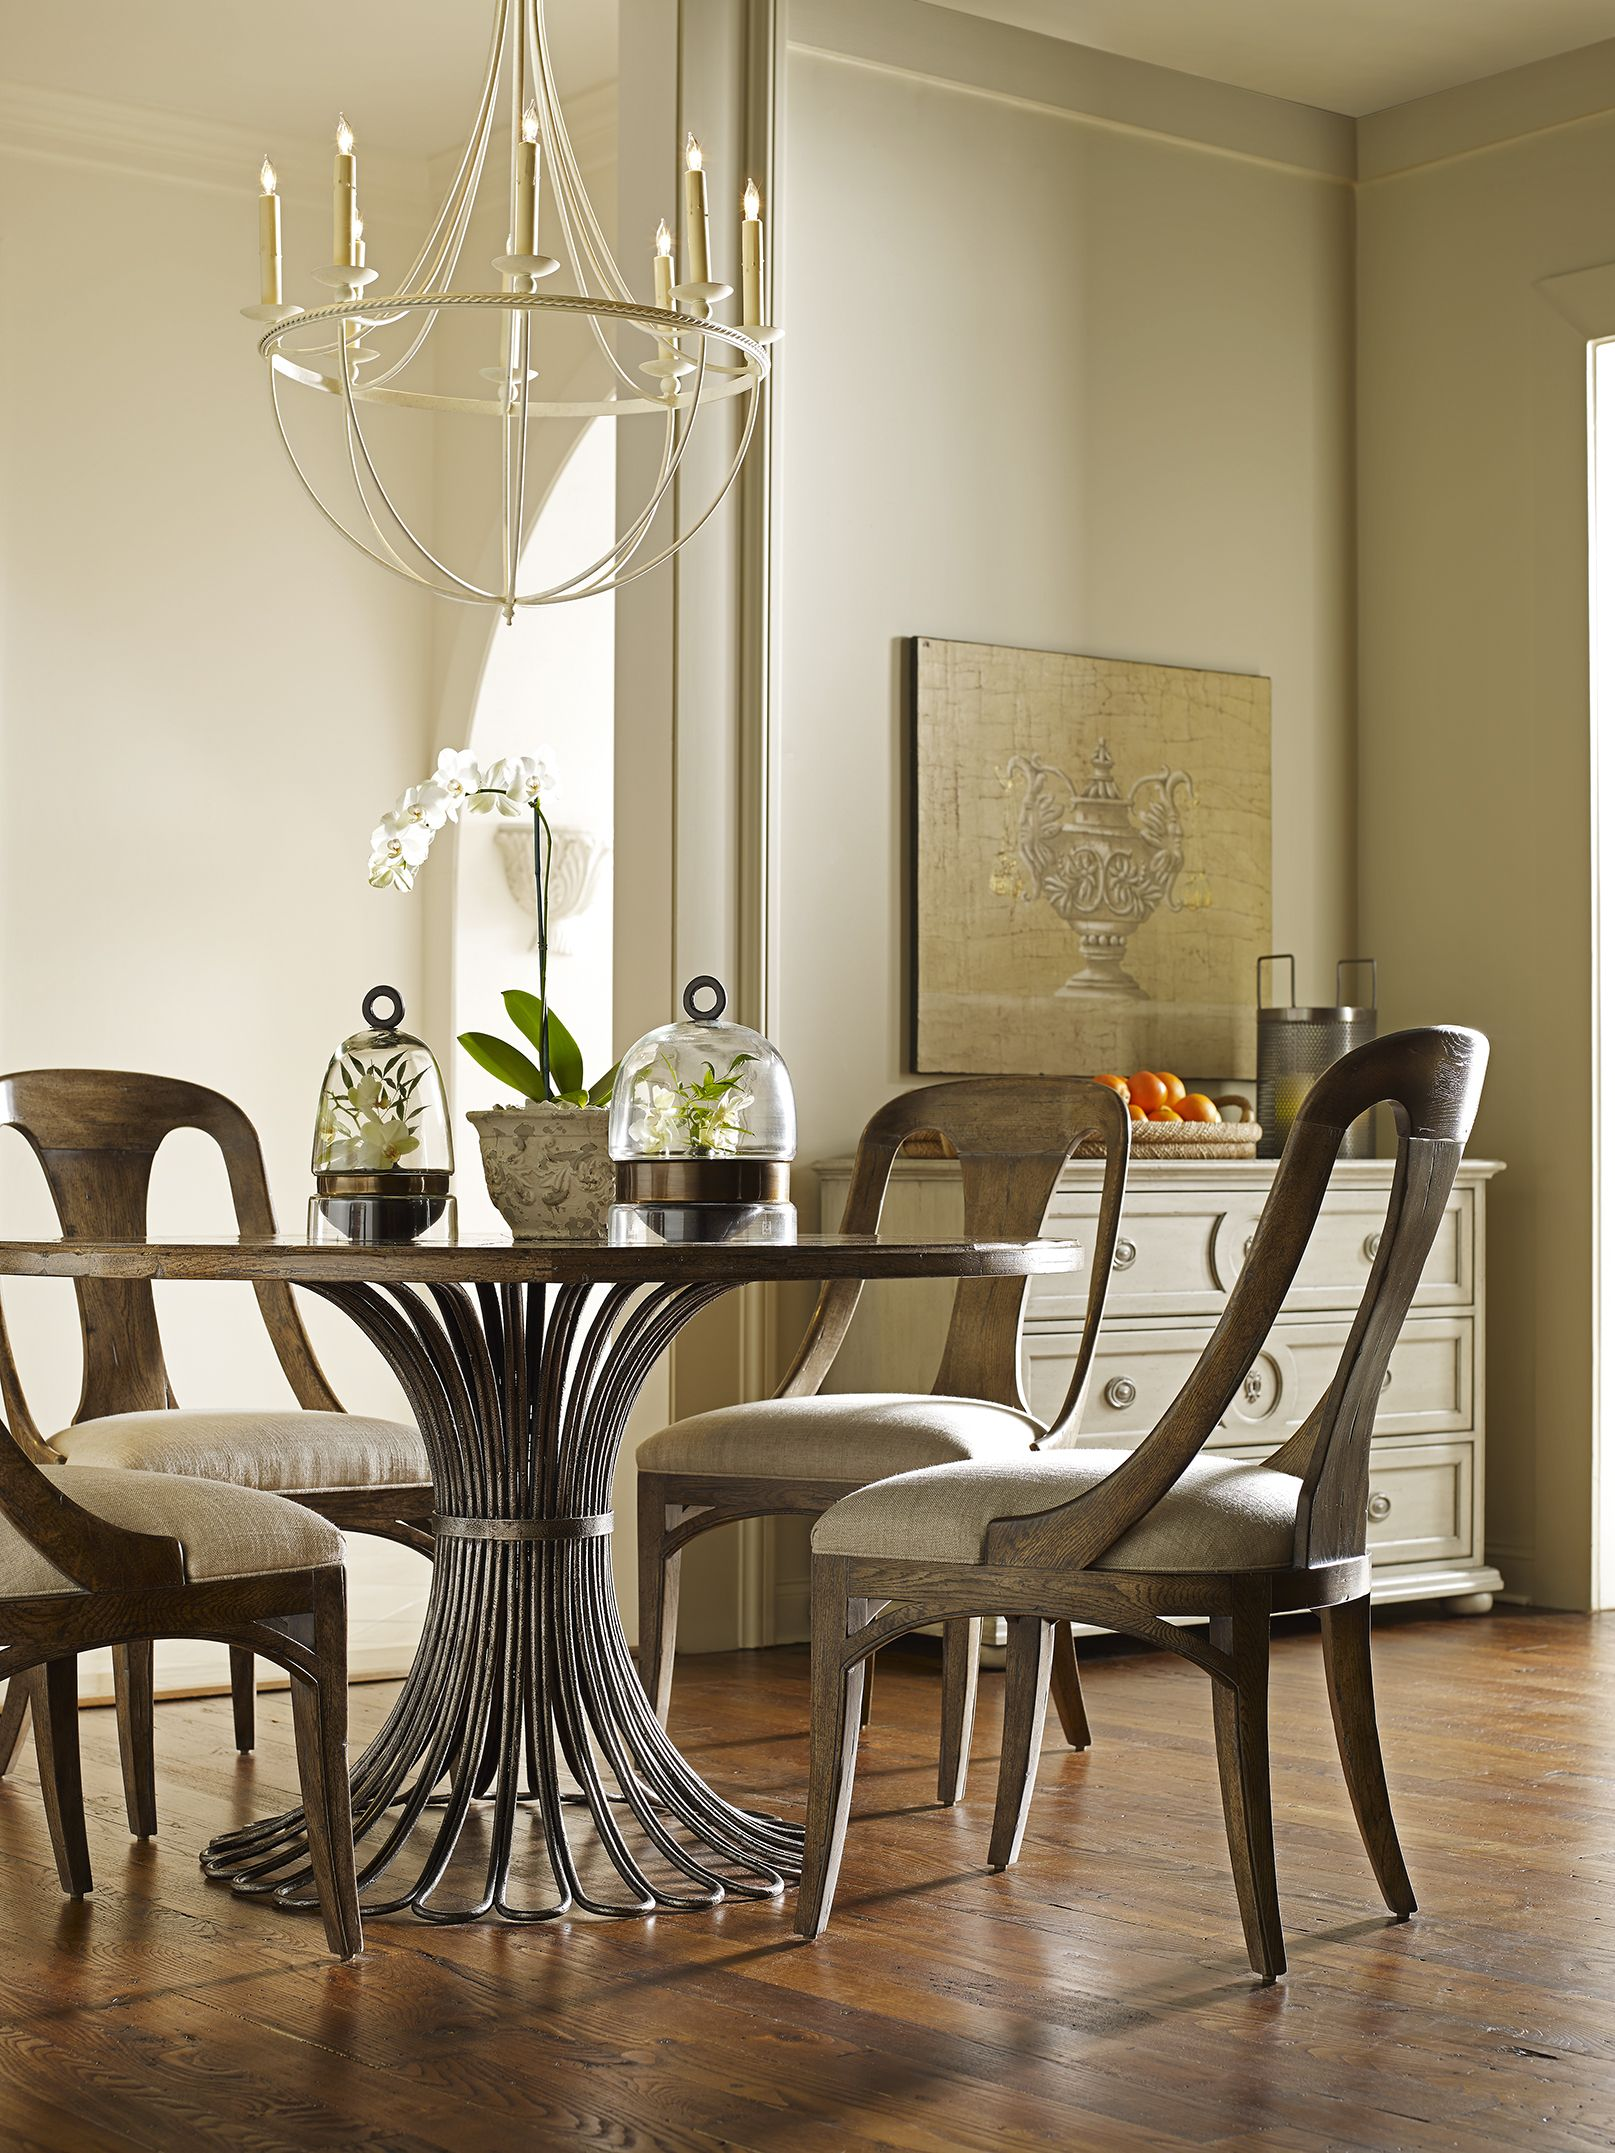 Parisian Dining Room Interesting Meridian Dining Table Gc0810 Parisian Side Chair Gc0300S Inspiration Design